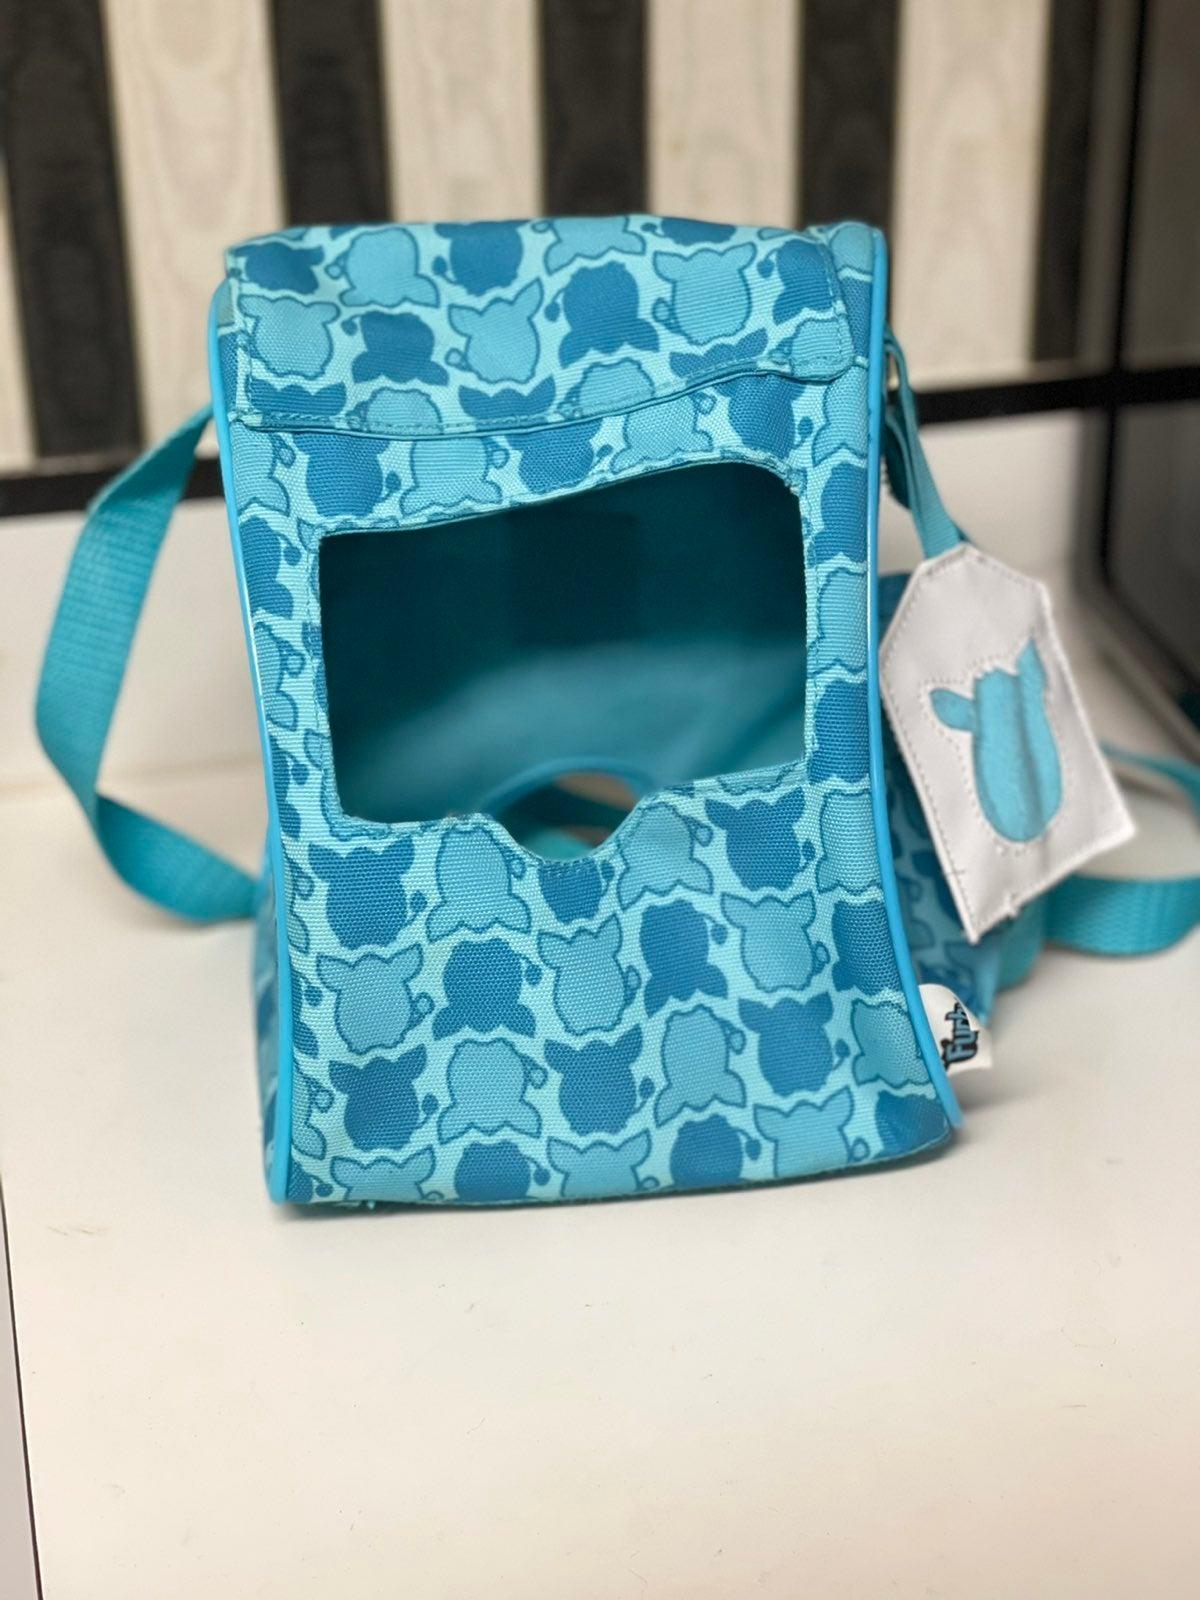 Furby Backpack